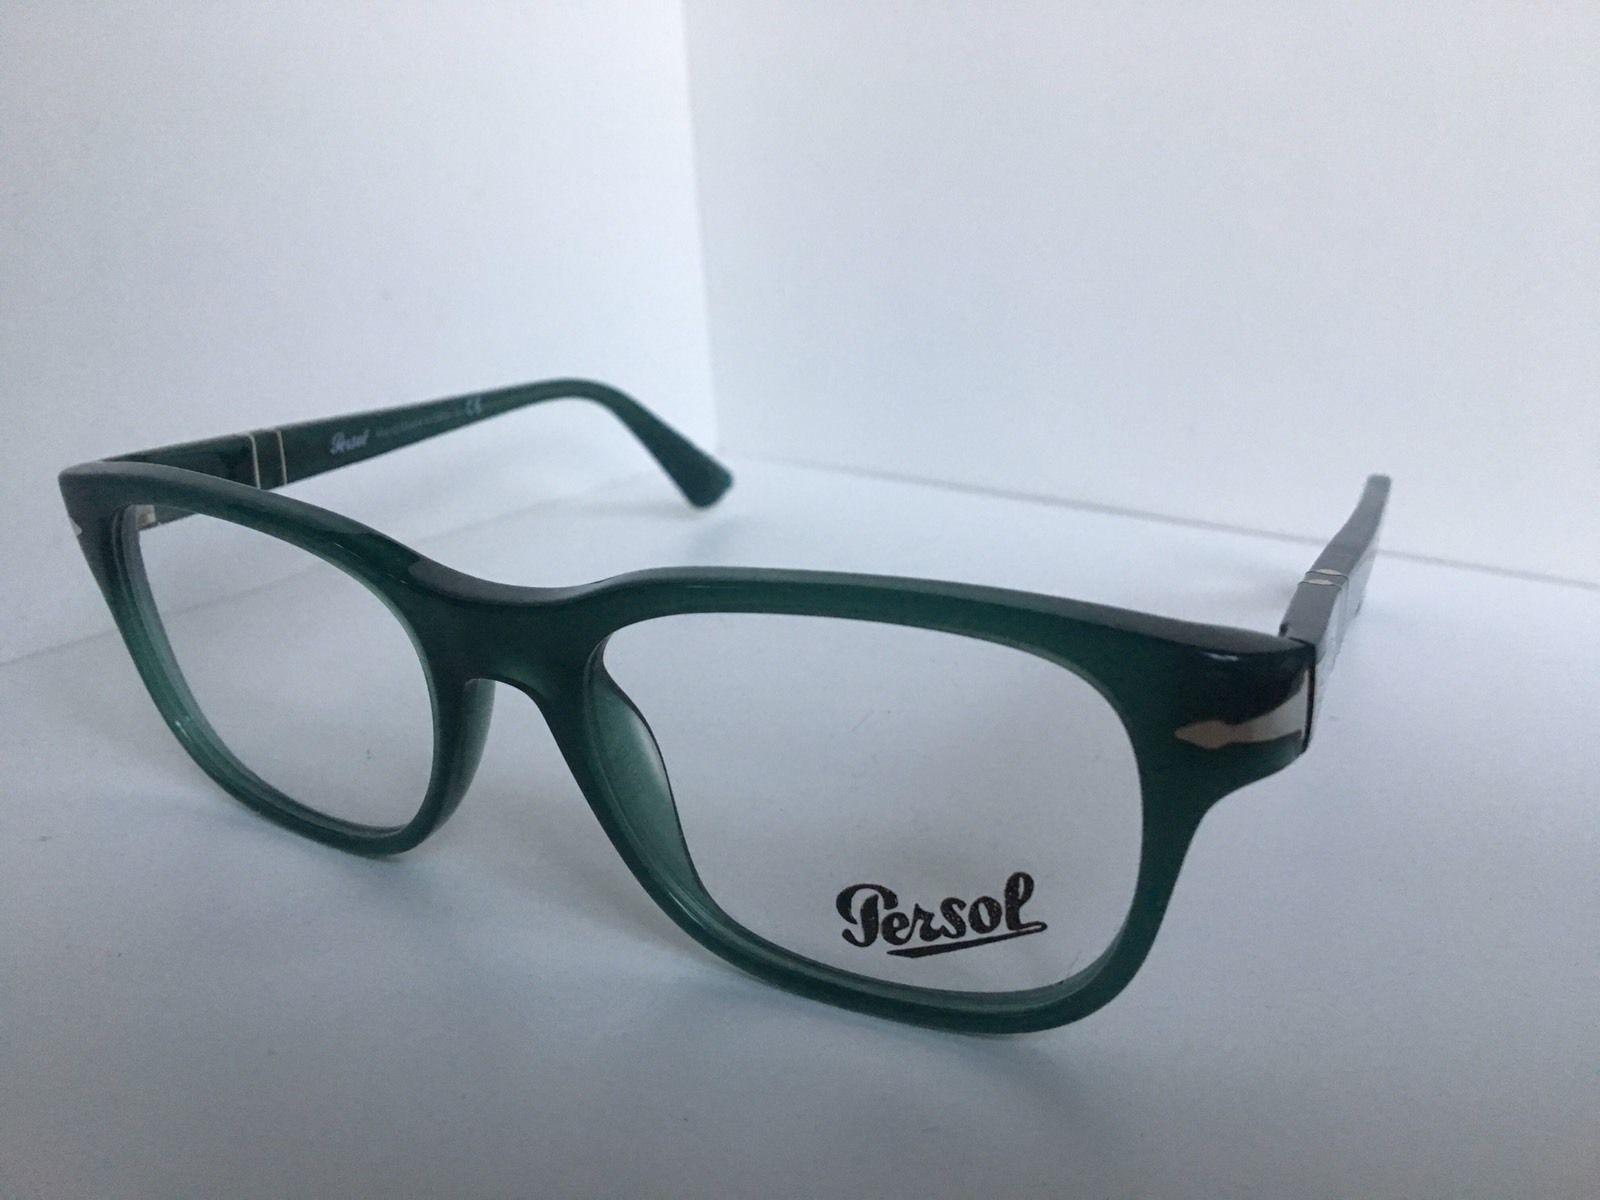 New Persol 3095-V 1001 Polished Green 53mm Rx Men's Eyeglasses Frame Italy